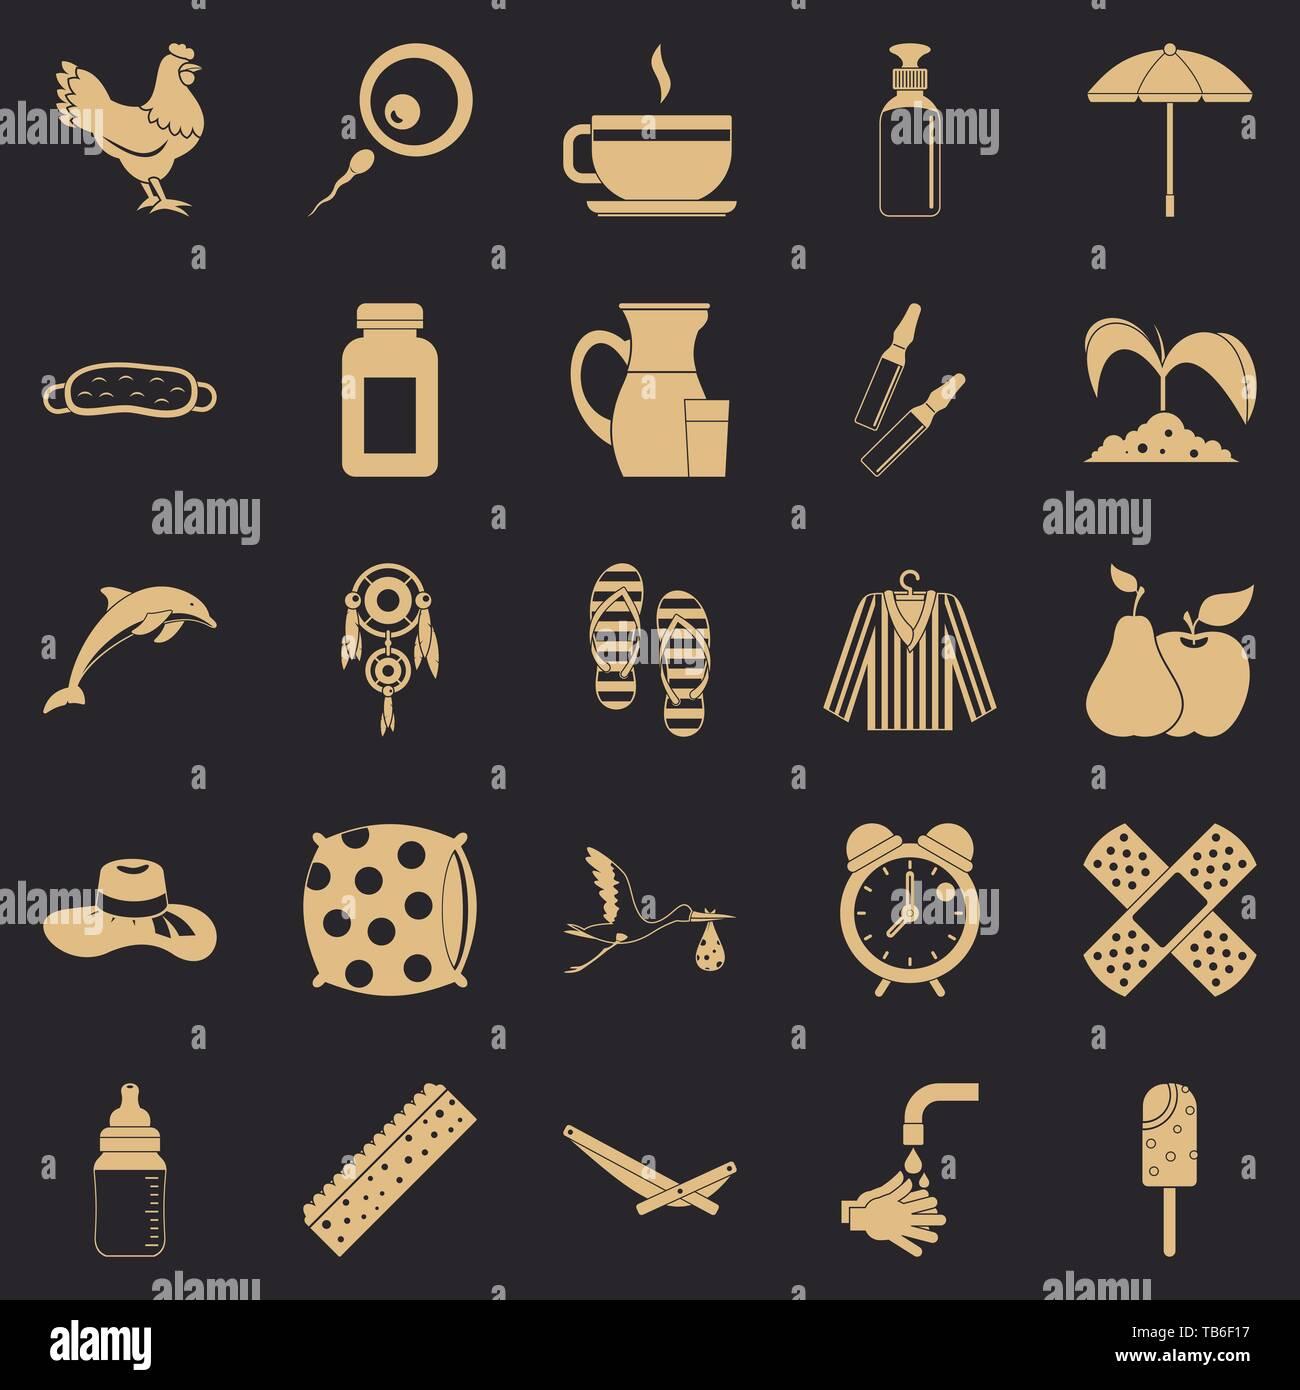 Kid viability icons set, simple style - Stock Image